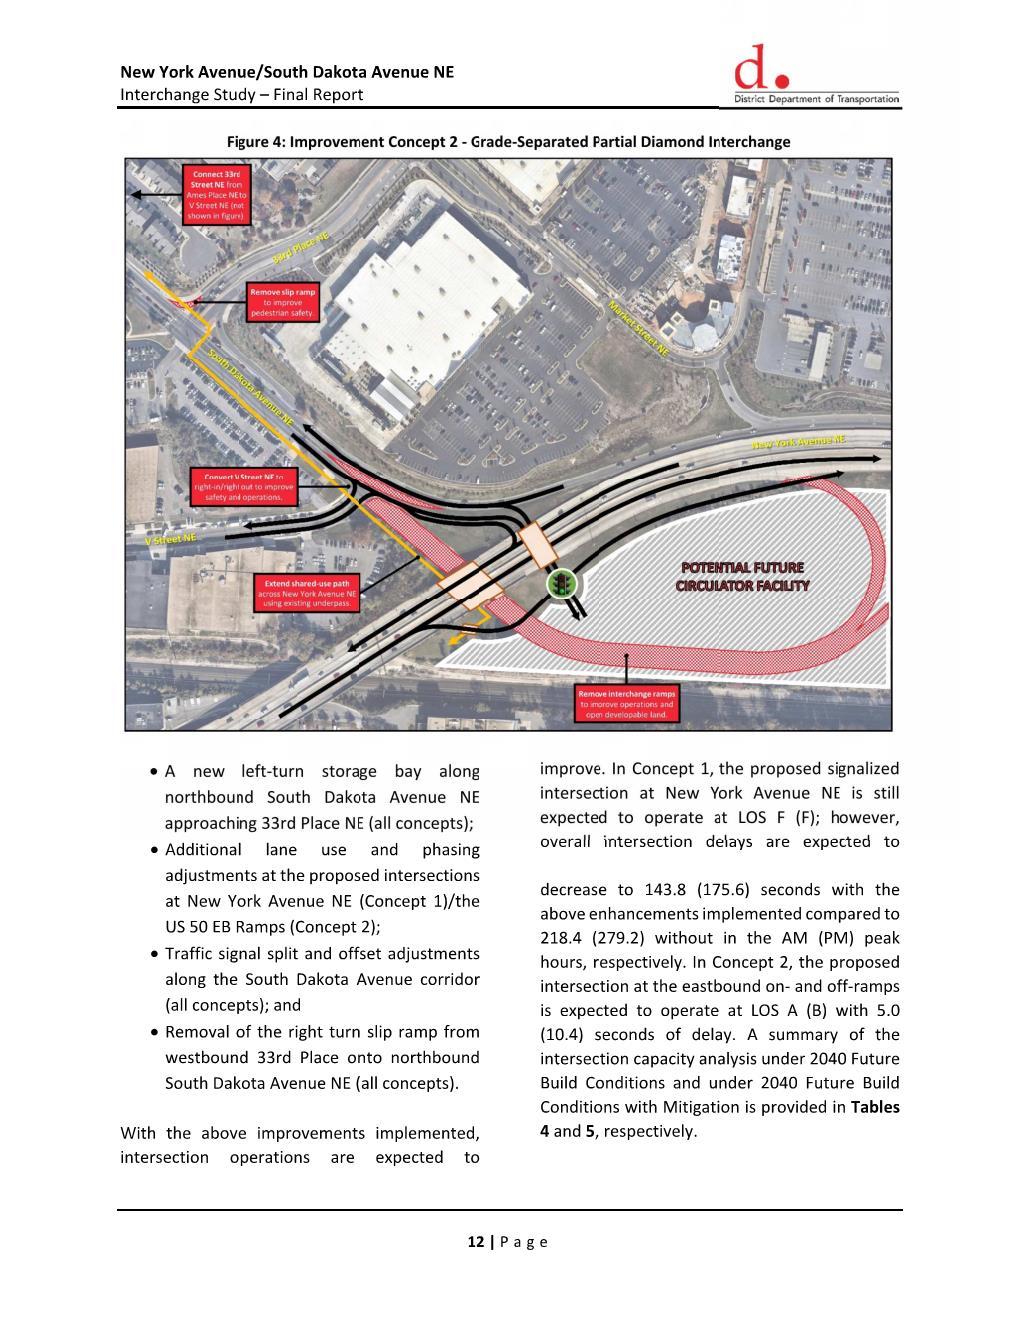 Futute conditions DDOT Page 005